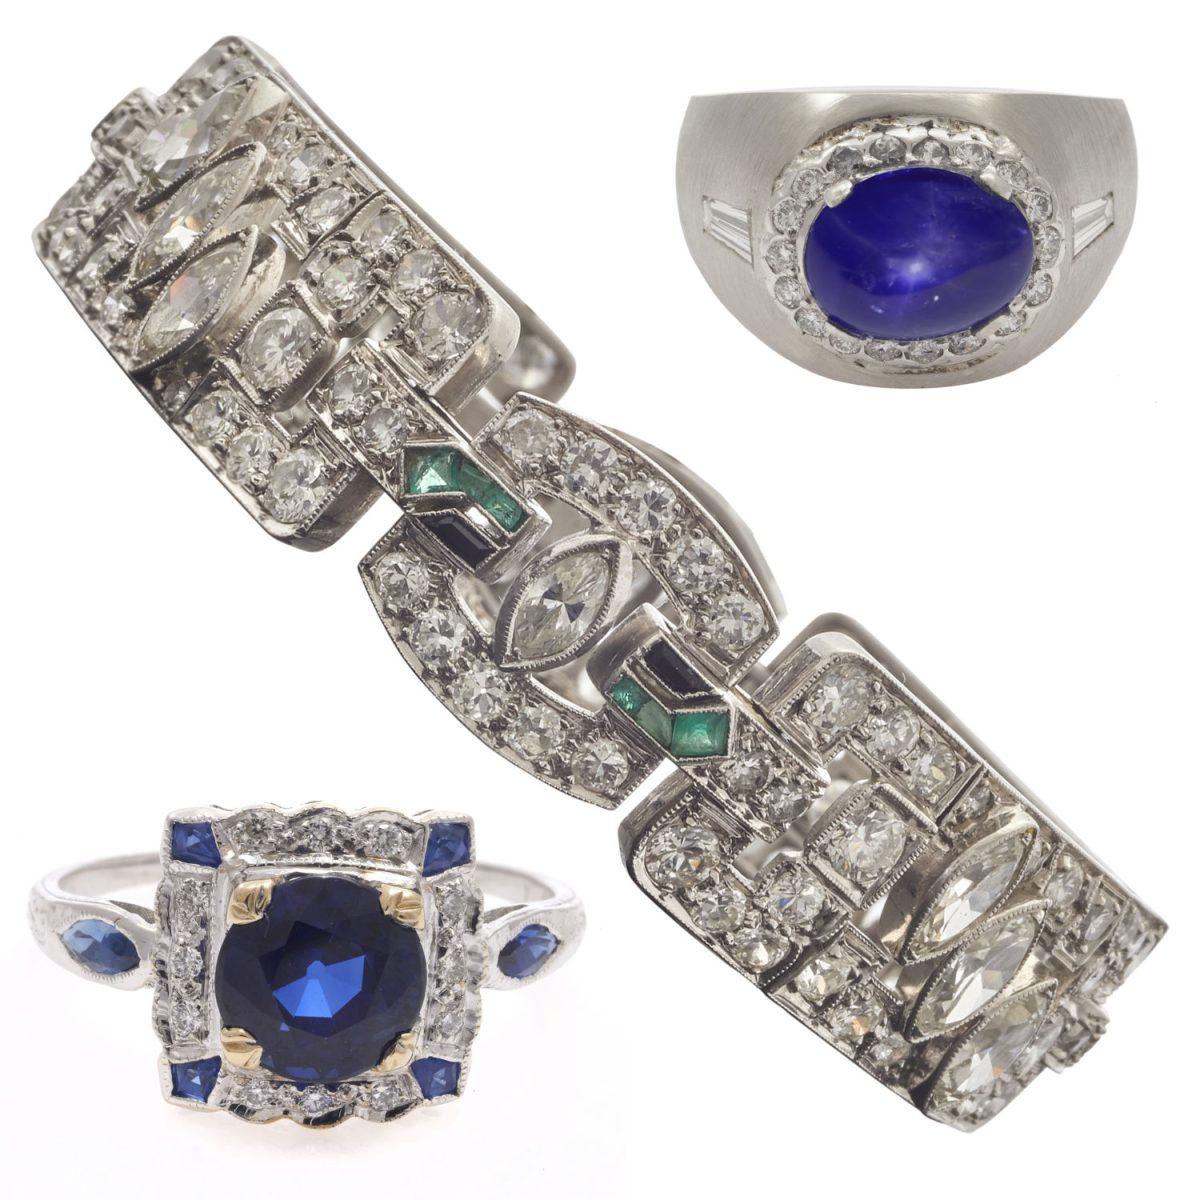 Very Fine Selecton of Estate Jewelry